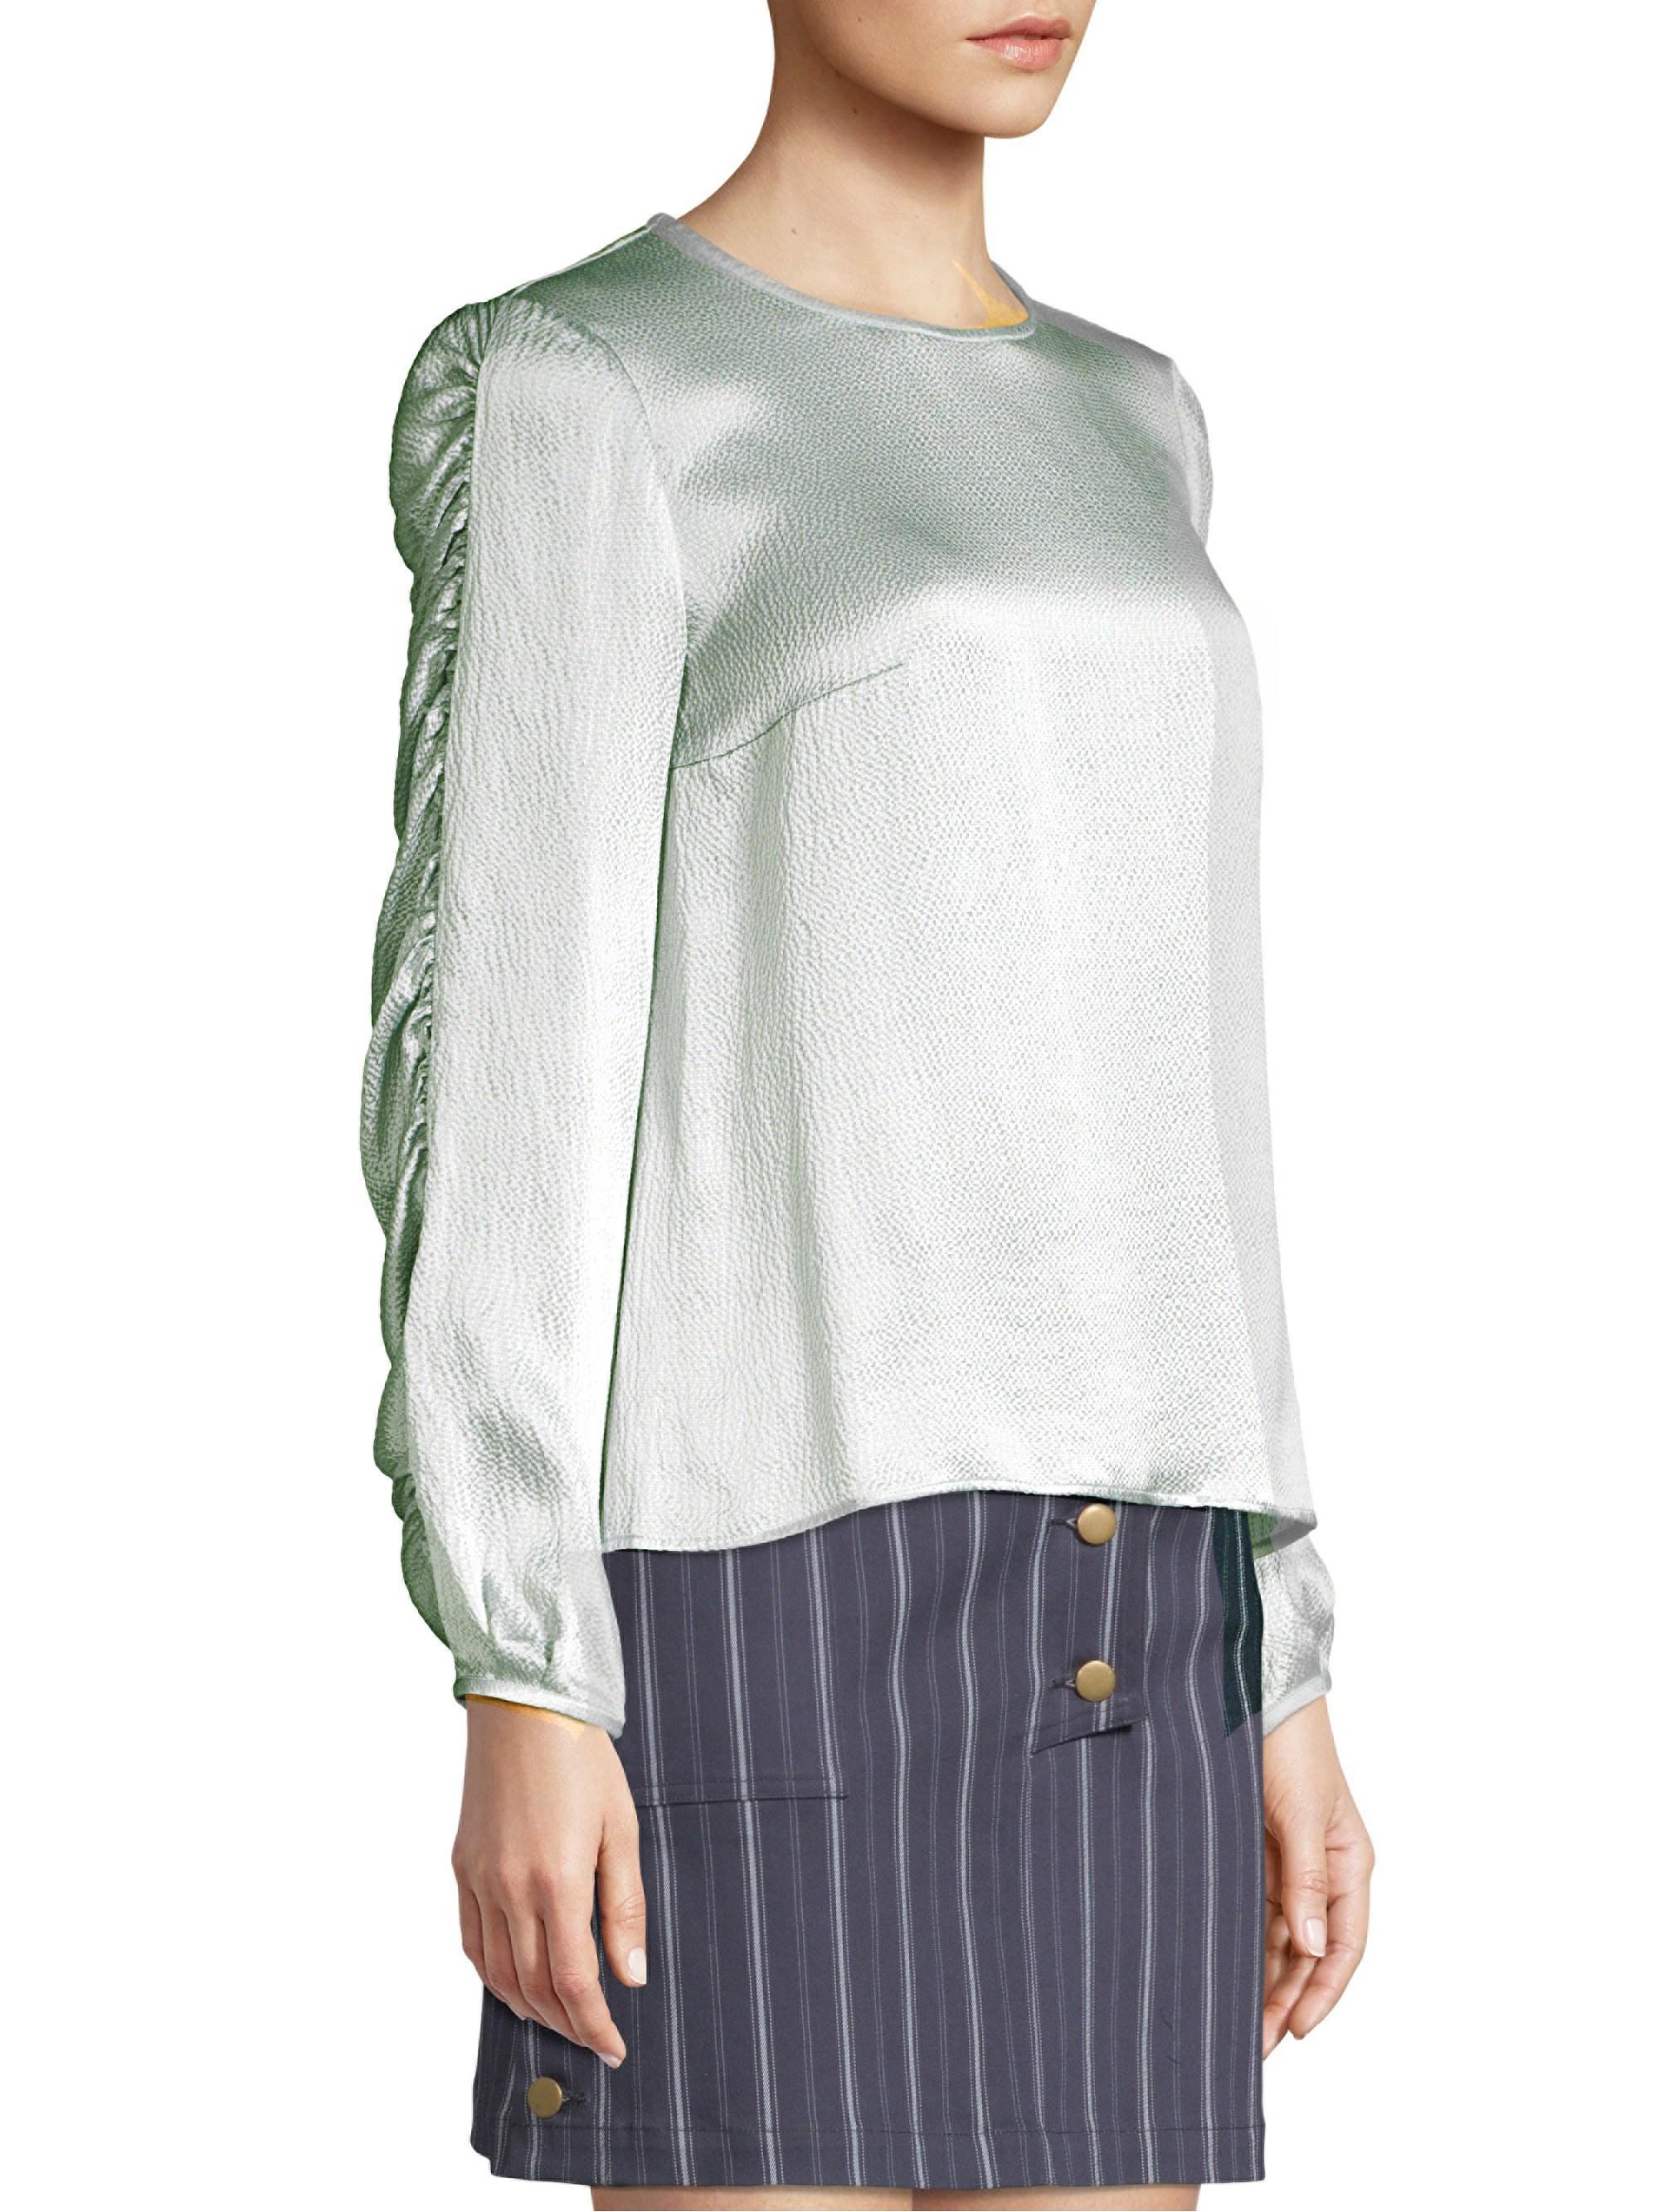 1a4a90f5e975a AMUR Alena Silk Top - Lyst